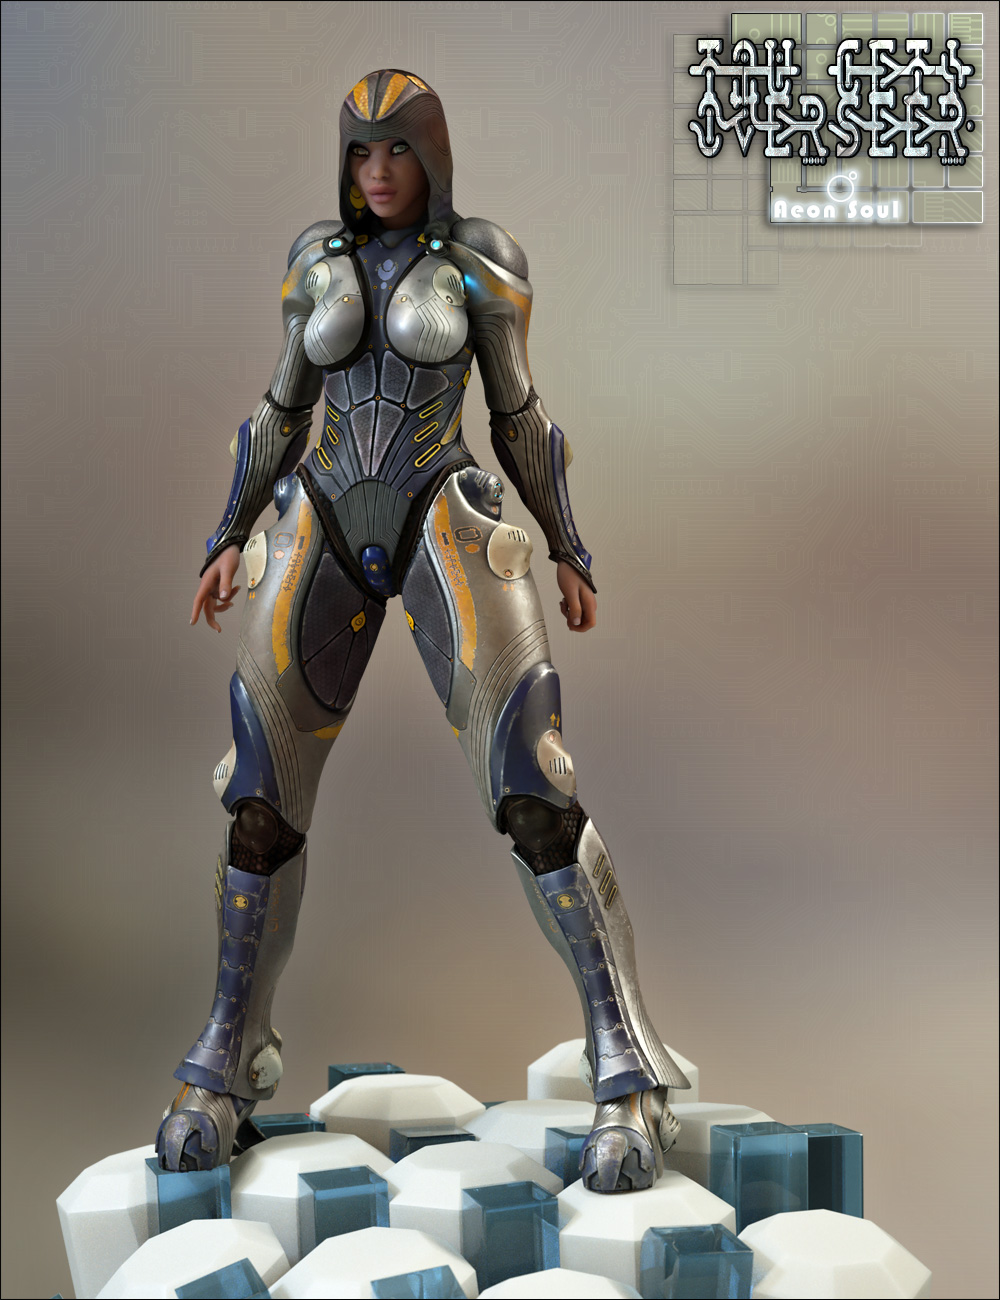 Tau Ceti Overseer by: Aeon Soul, 3D Models by Daz 3D